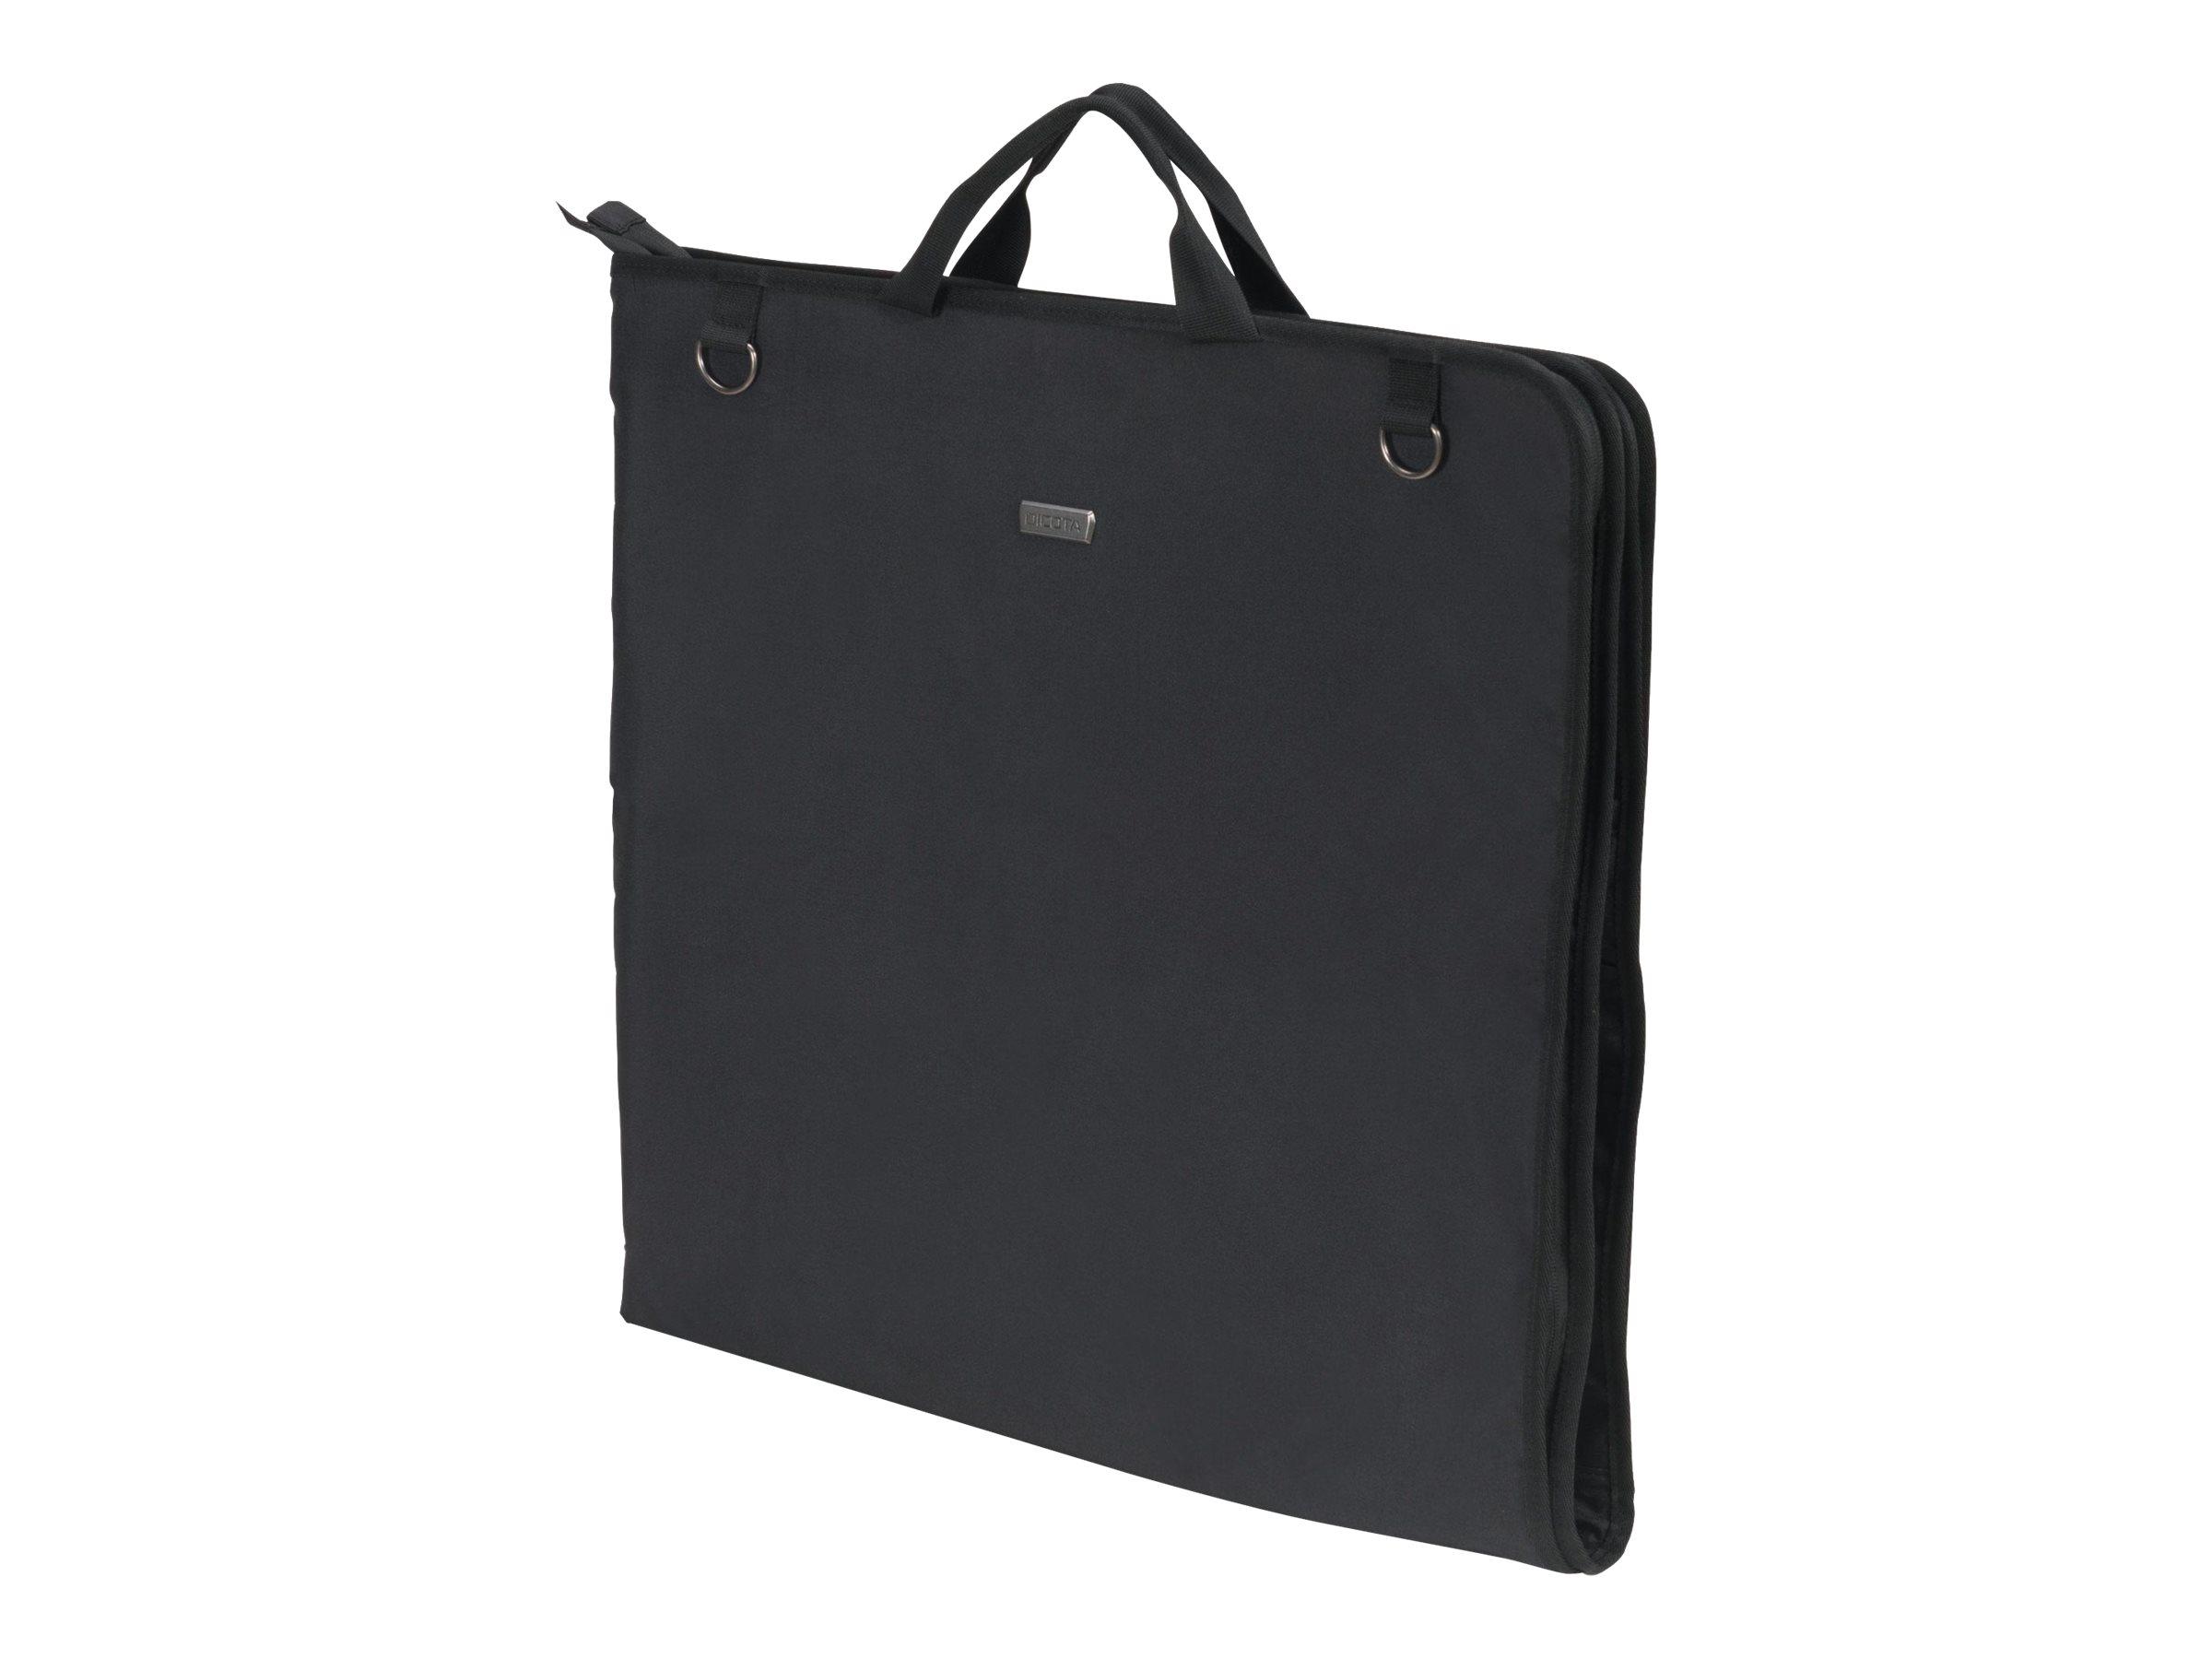 DICOTA Eco Garment Cover SELECT - Kleiderhülle - recycletes PET, 300D Polyester